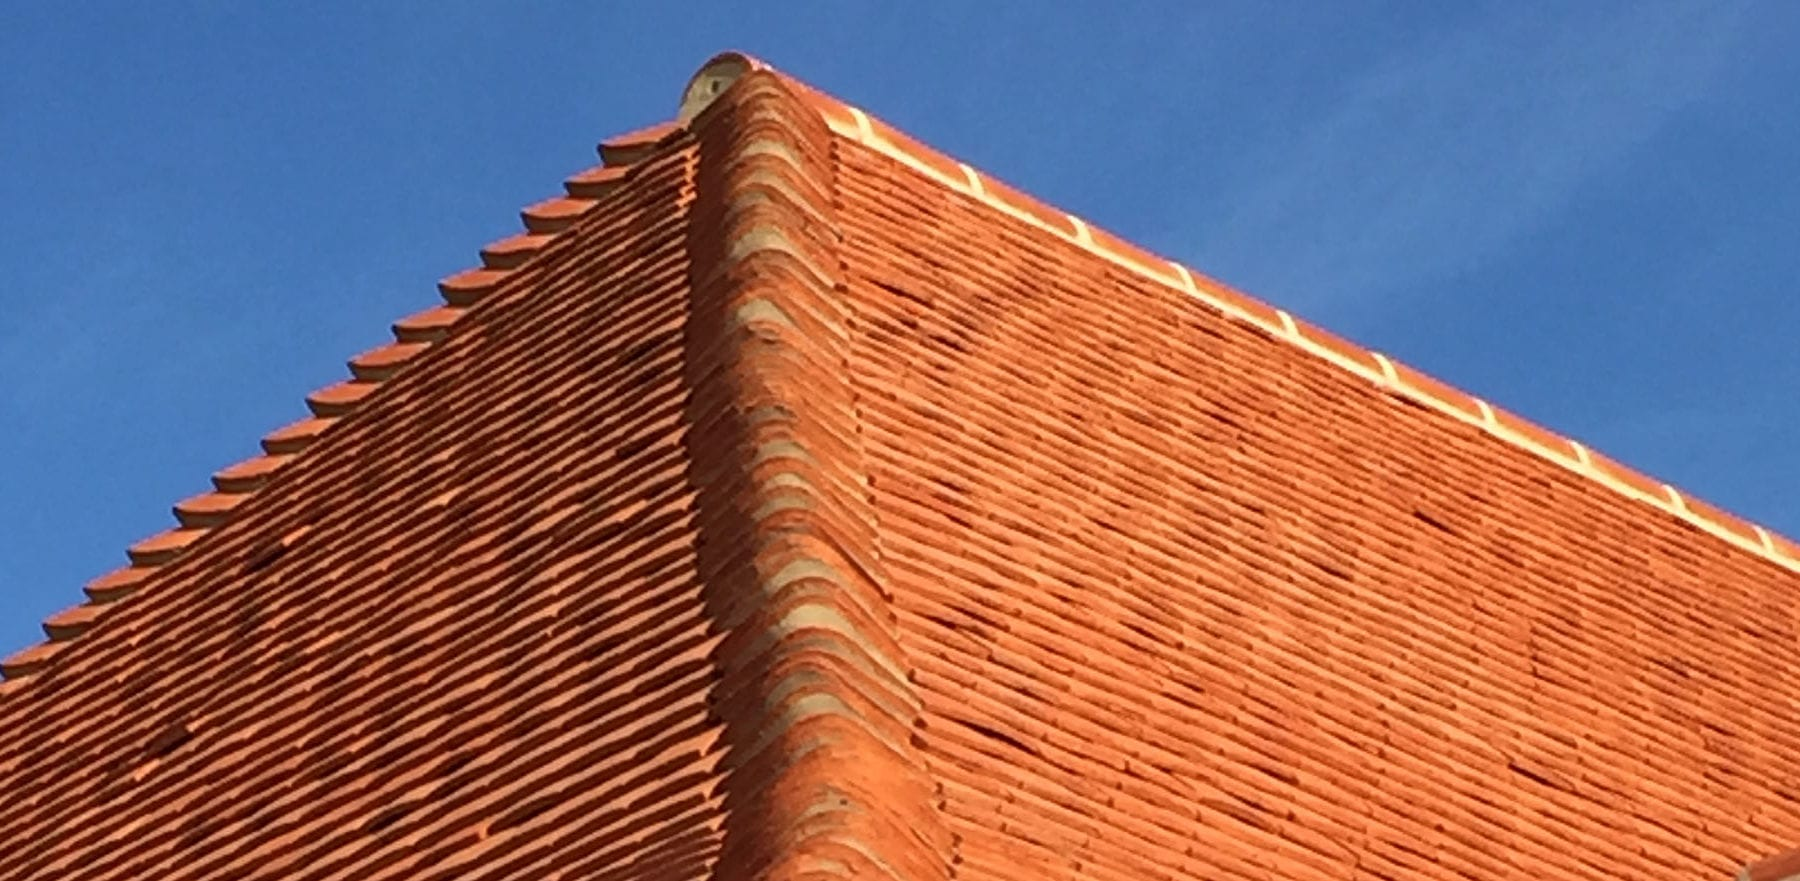 Lifestiles - Handcrafted Pentlow Clay Roof Tiles - Petersfield, England 6